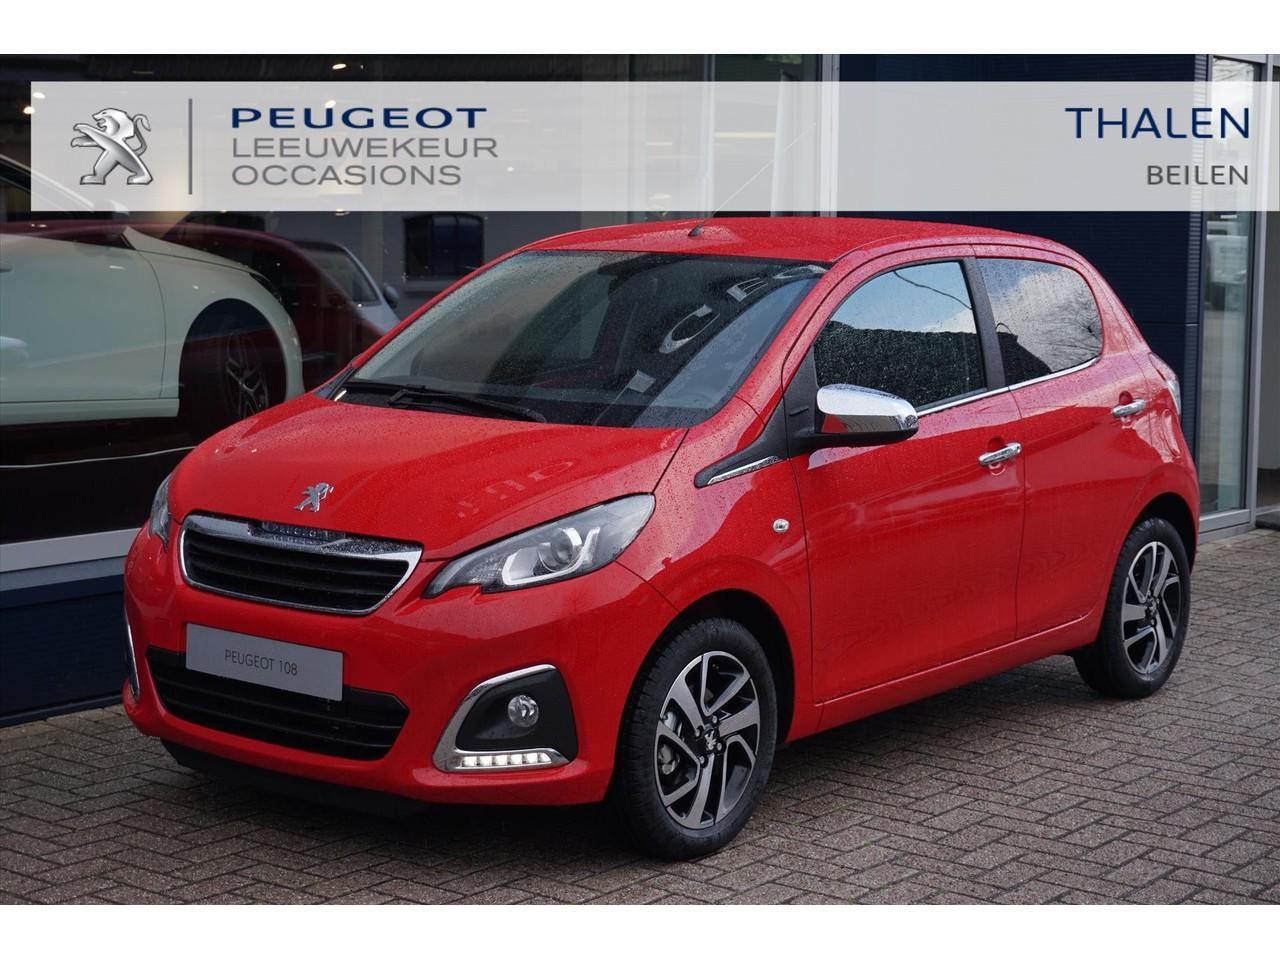 Peugeot 108 72pk 5d allure nieuwe auto